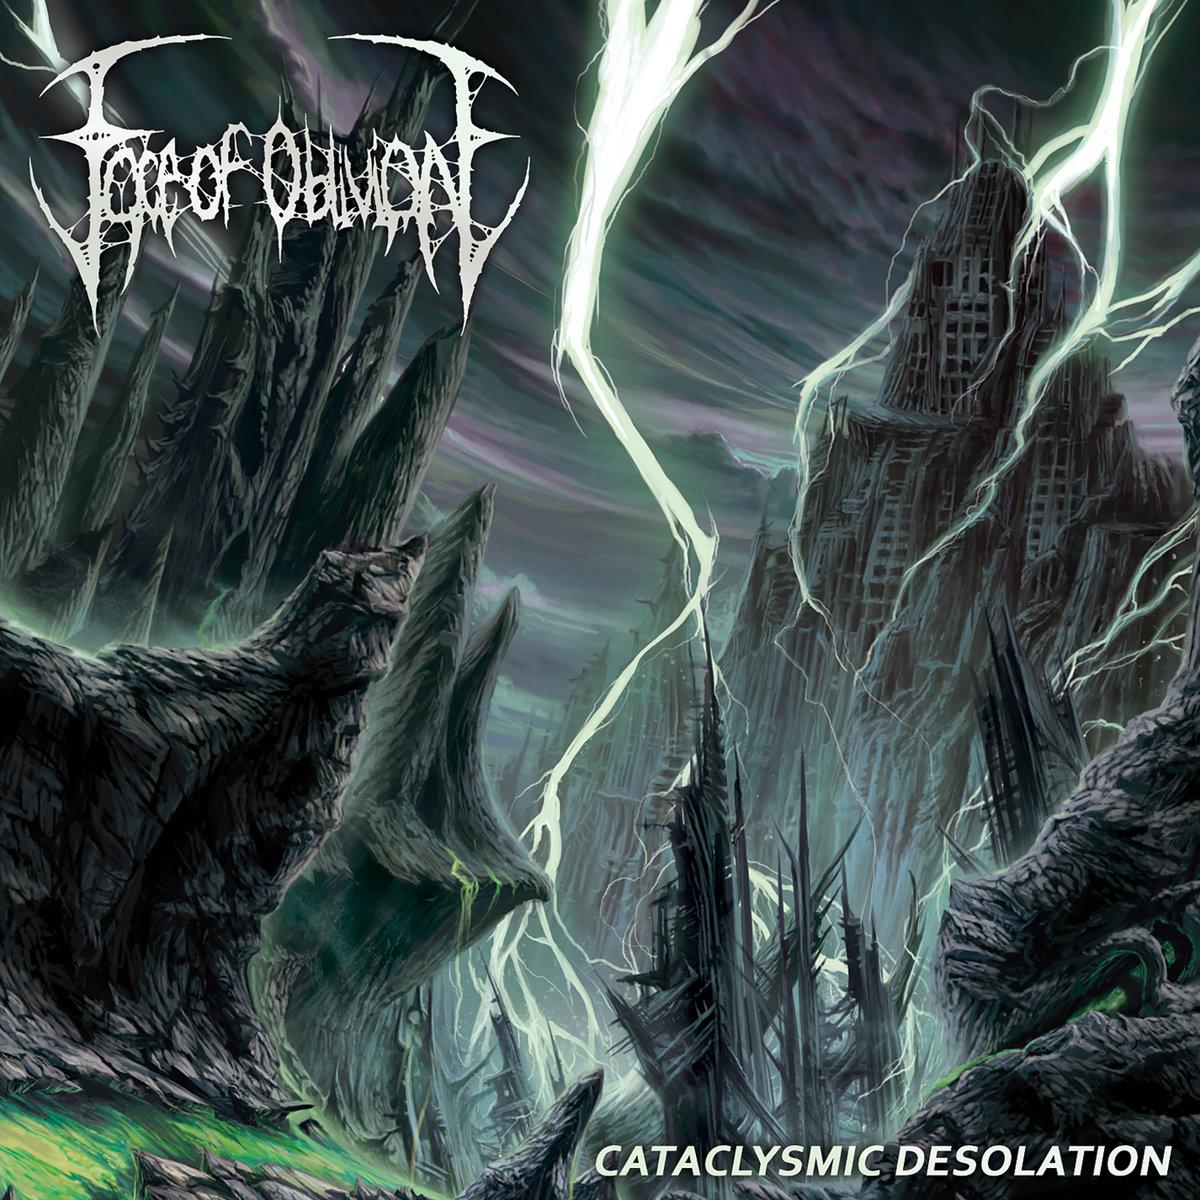 Cataclysmic Desolation | Comatose Music